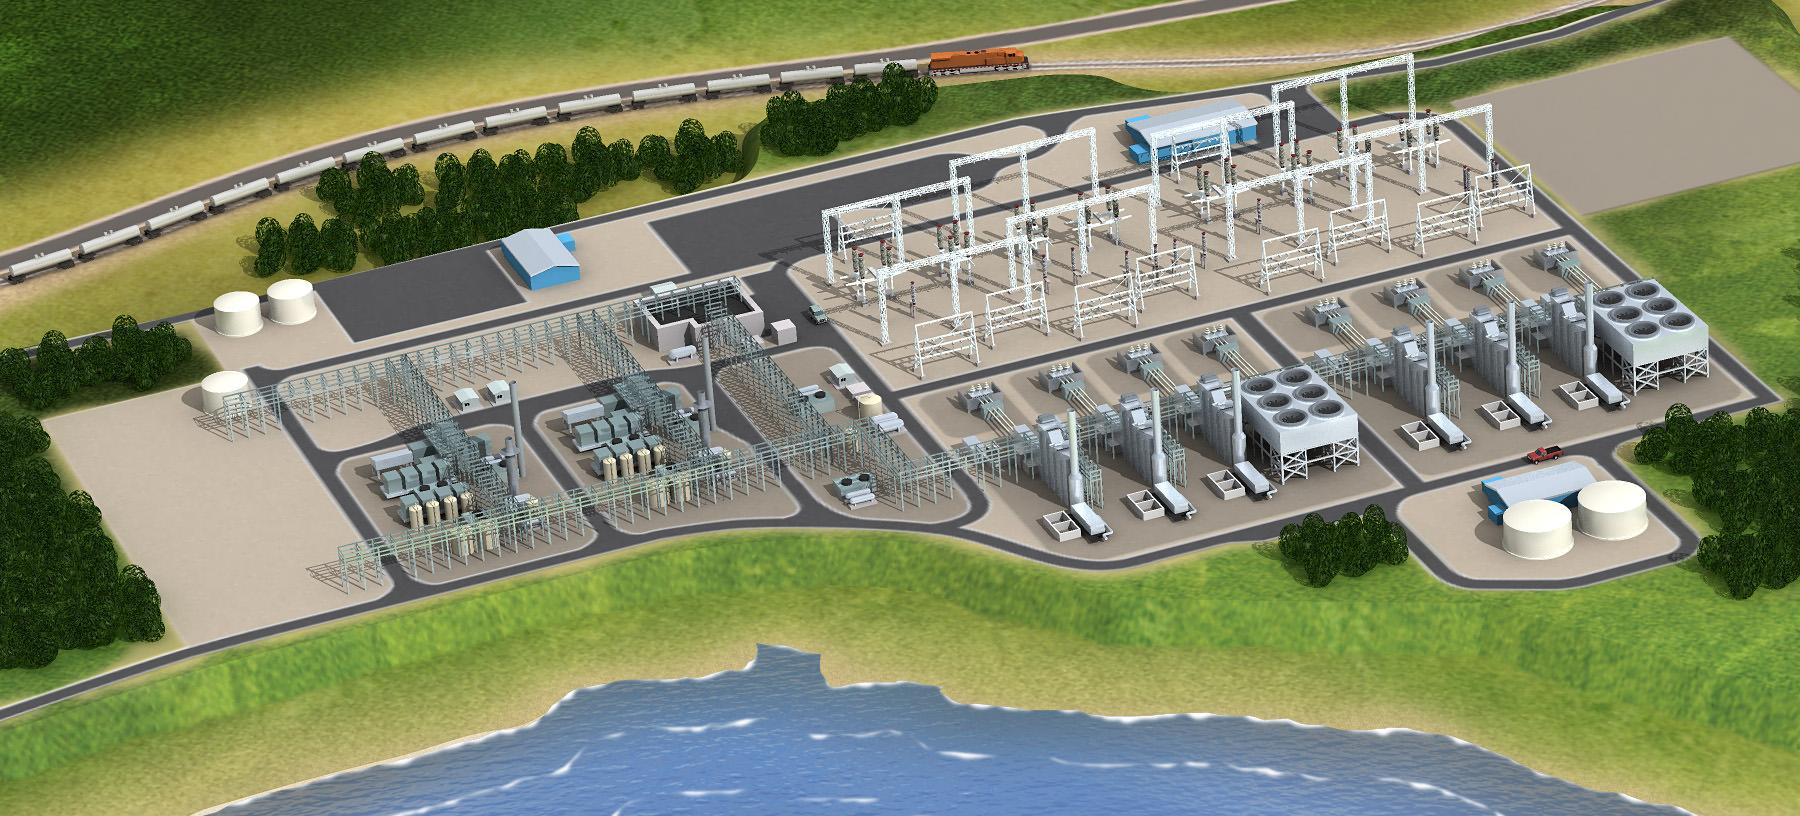 Jordan Cove LNG Terminal 2